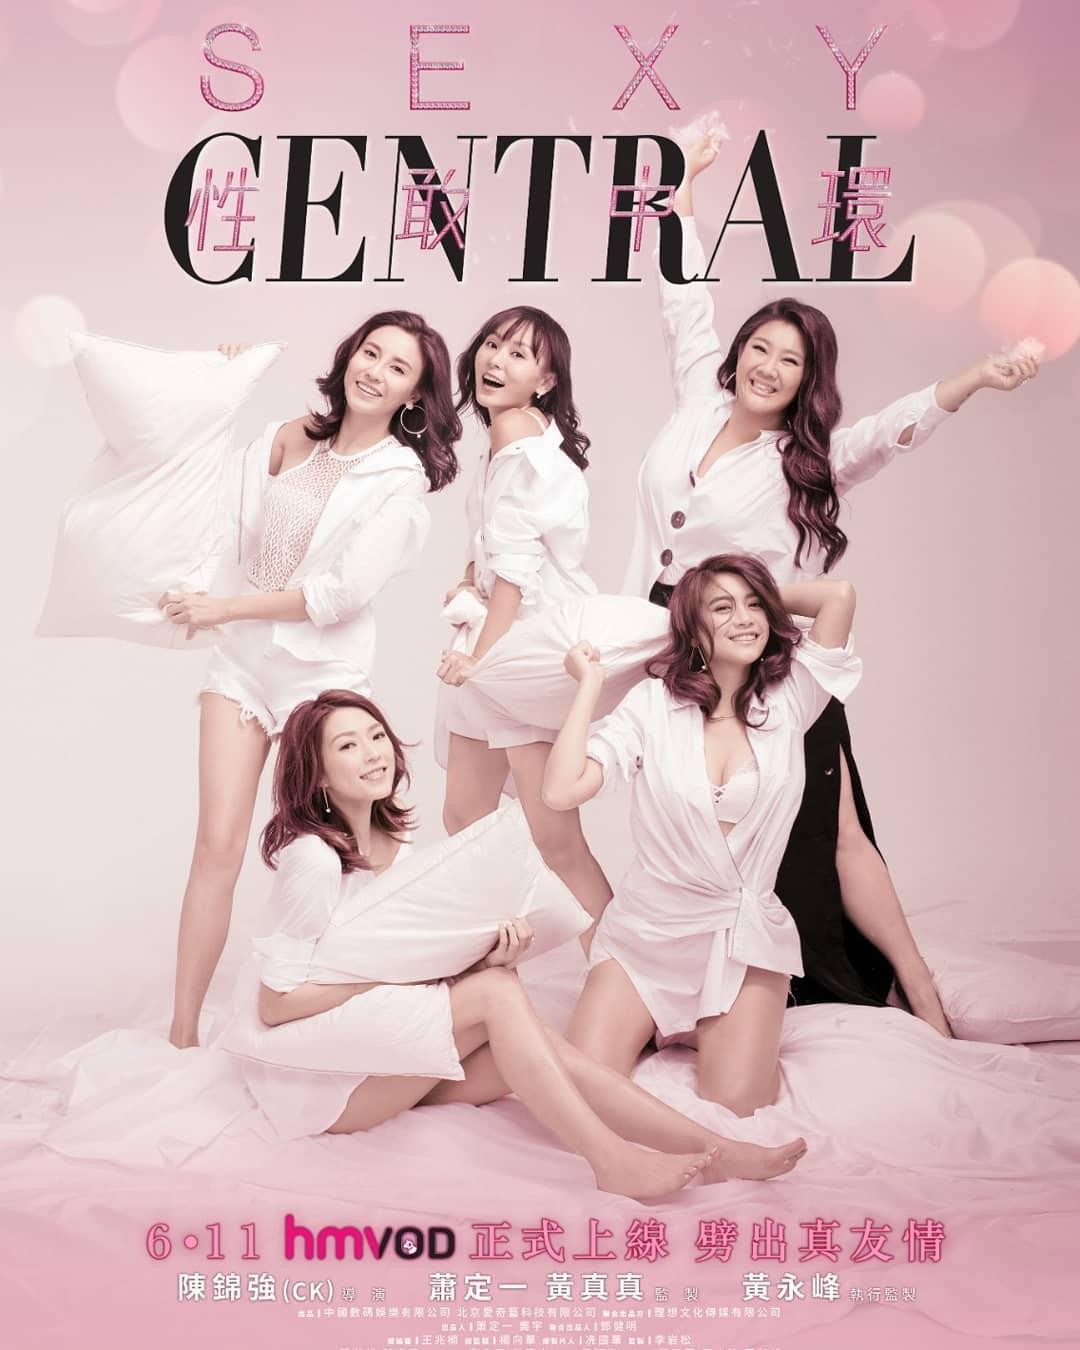 Sexy Central – 性敢中环